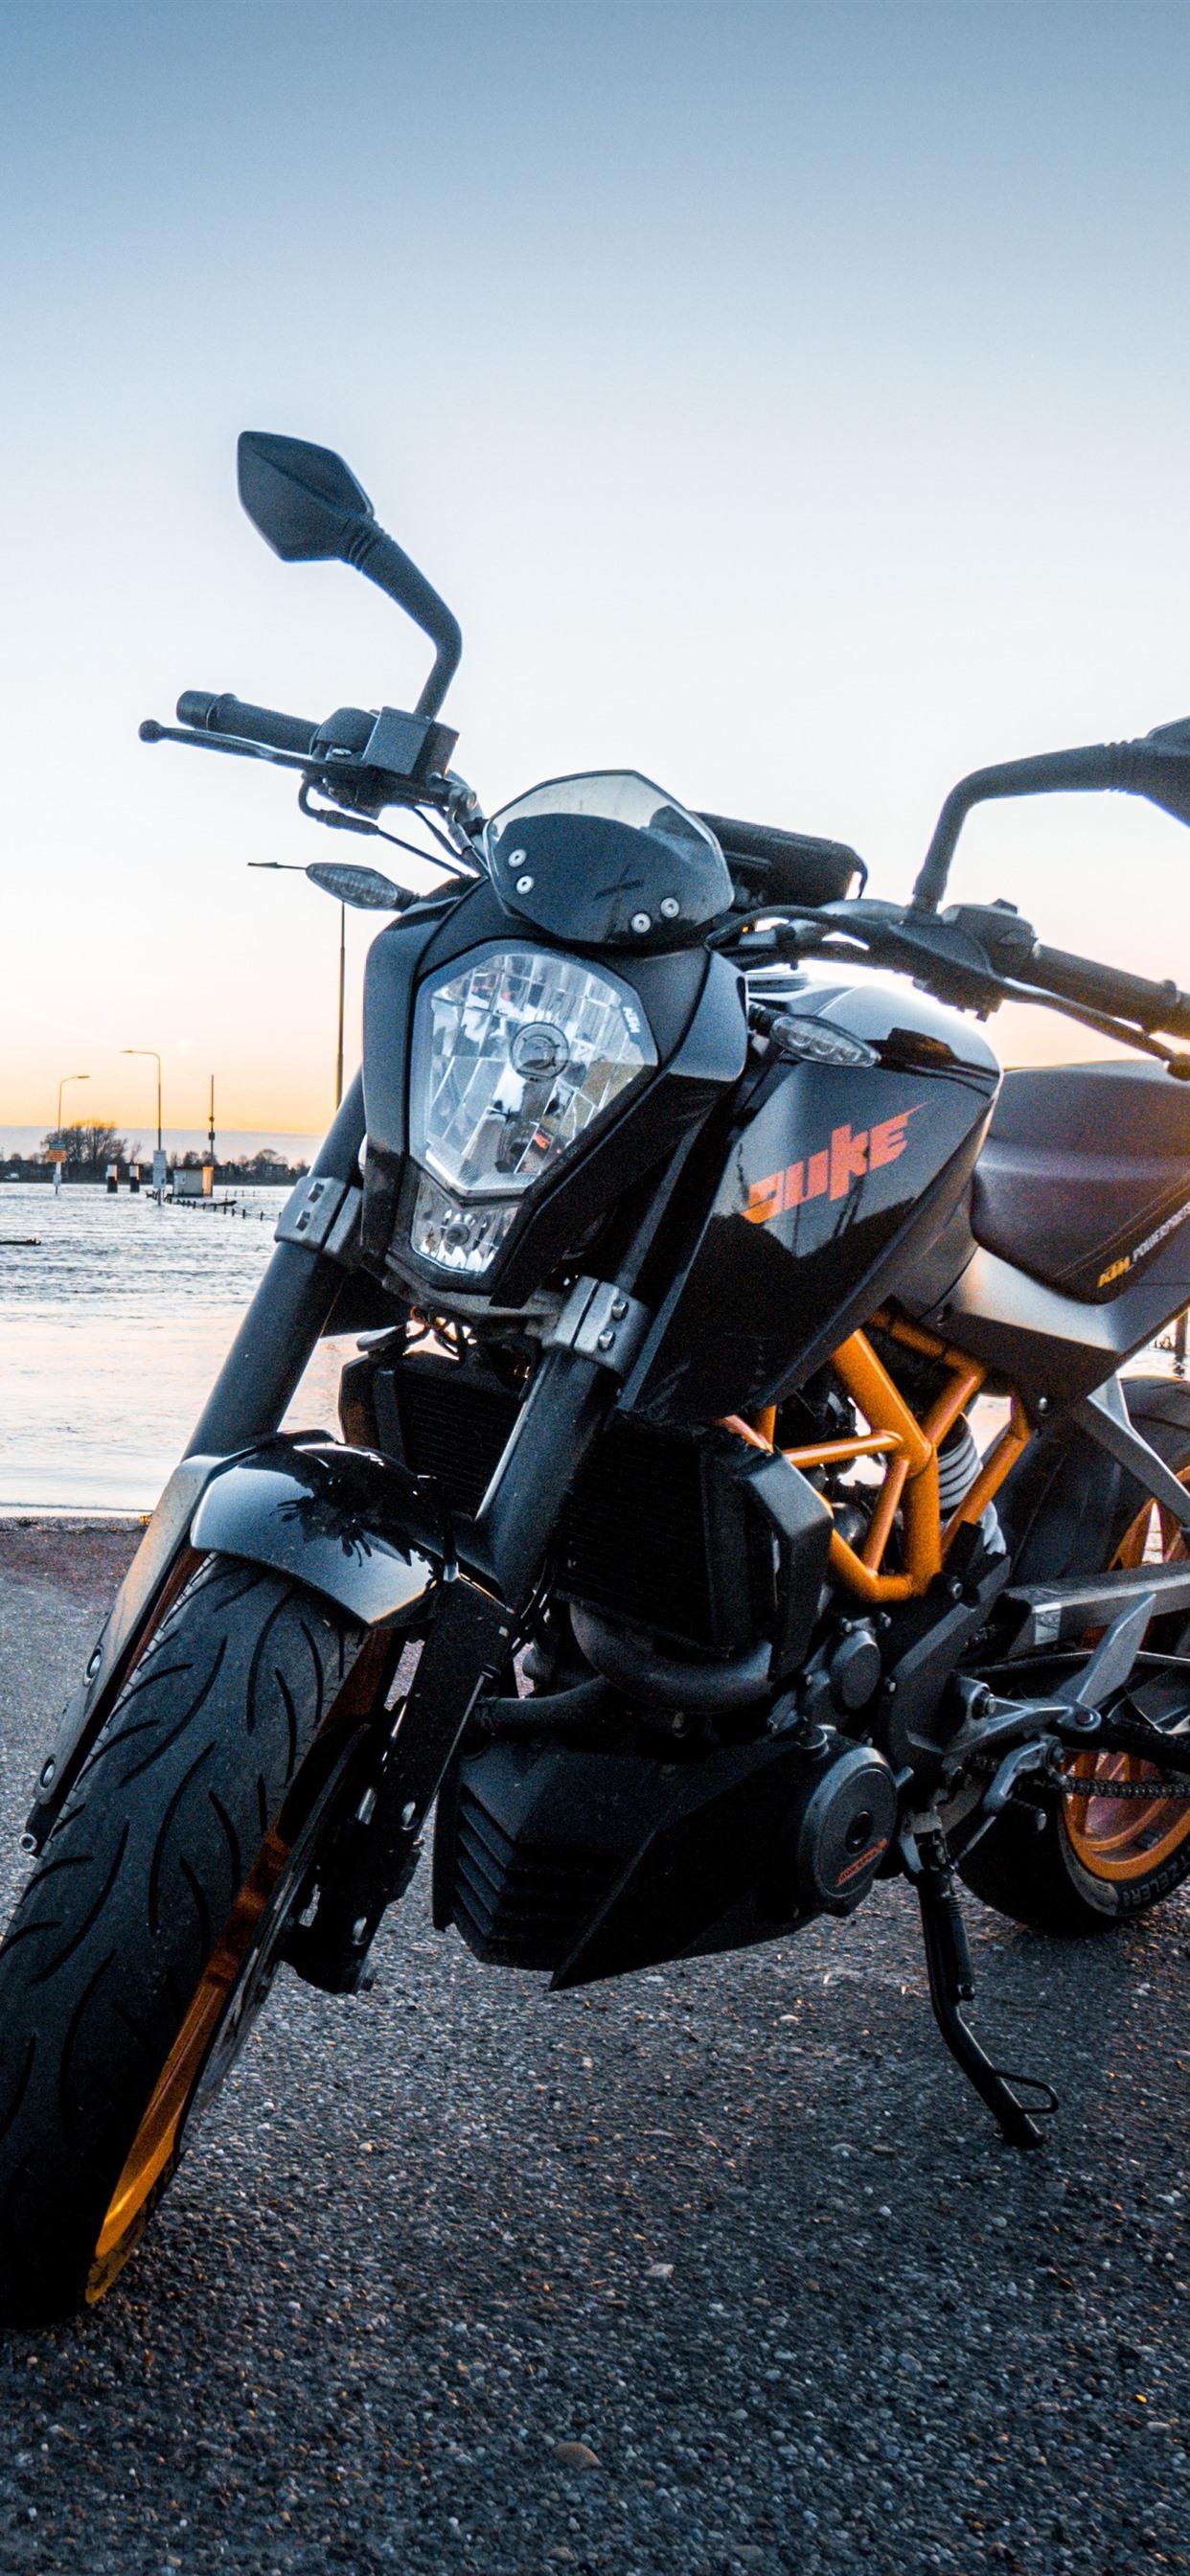 Wallpaper Ktm Motorcycle Front View River 5120x2880 Uhd 5k